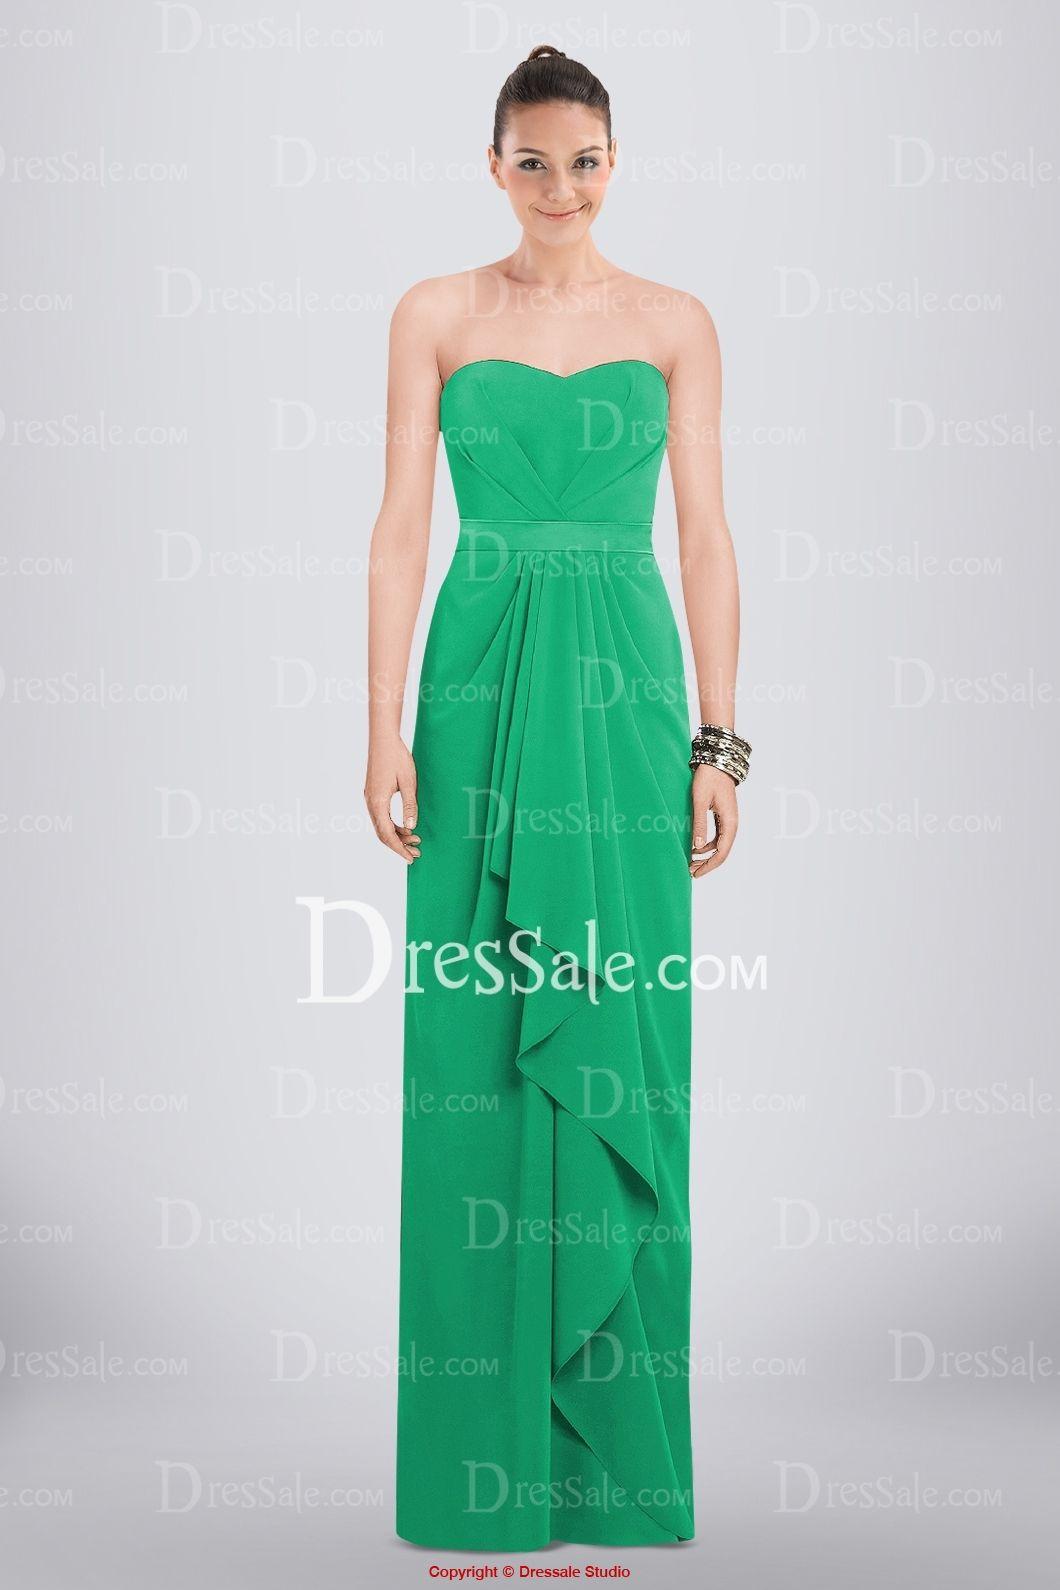 Breezy Sweetheart Floor-length Bridesmaid Dress Featuring Feminine Ruffles